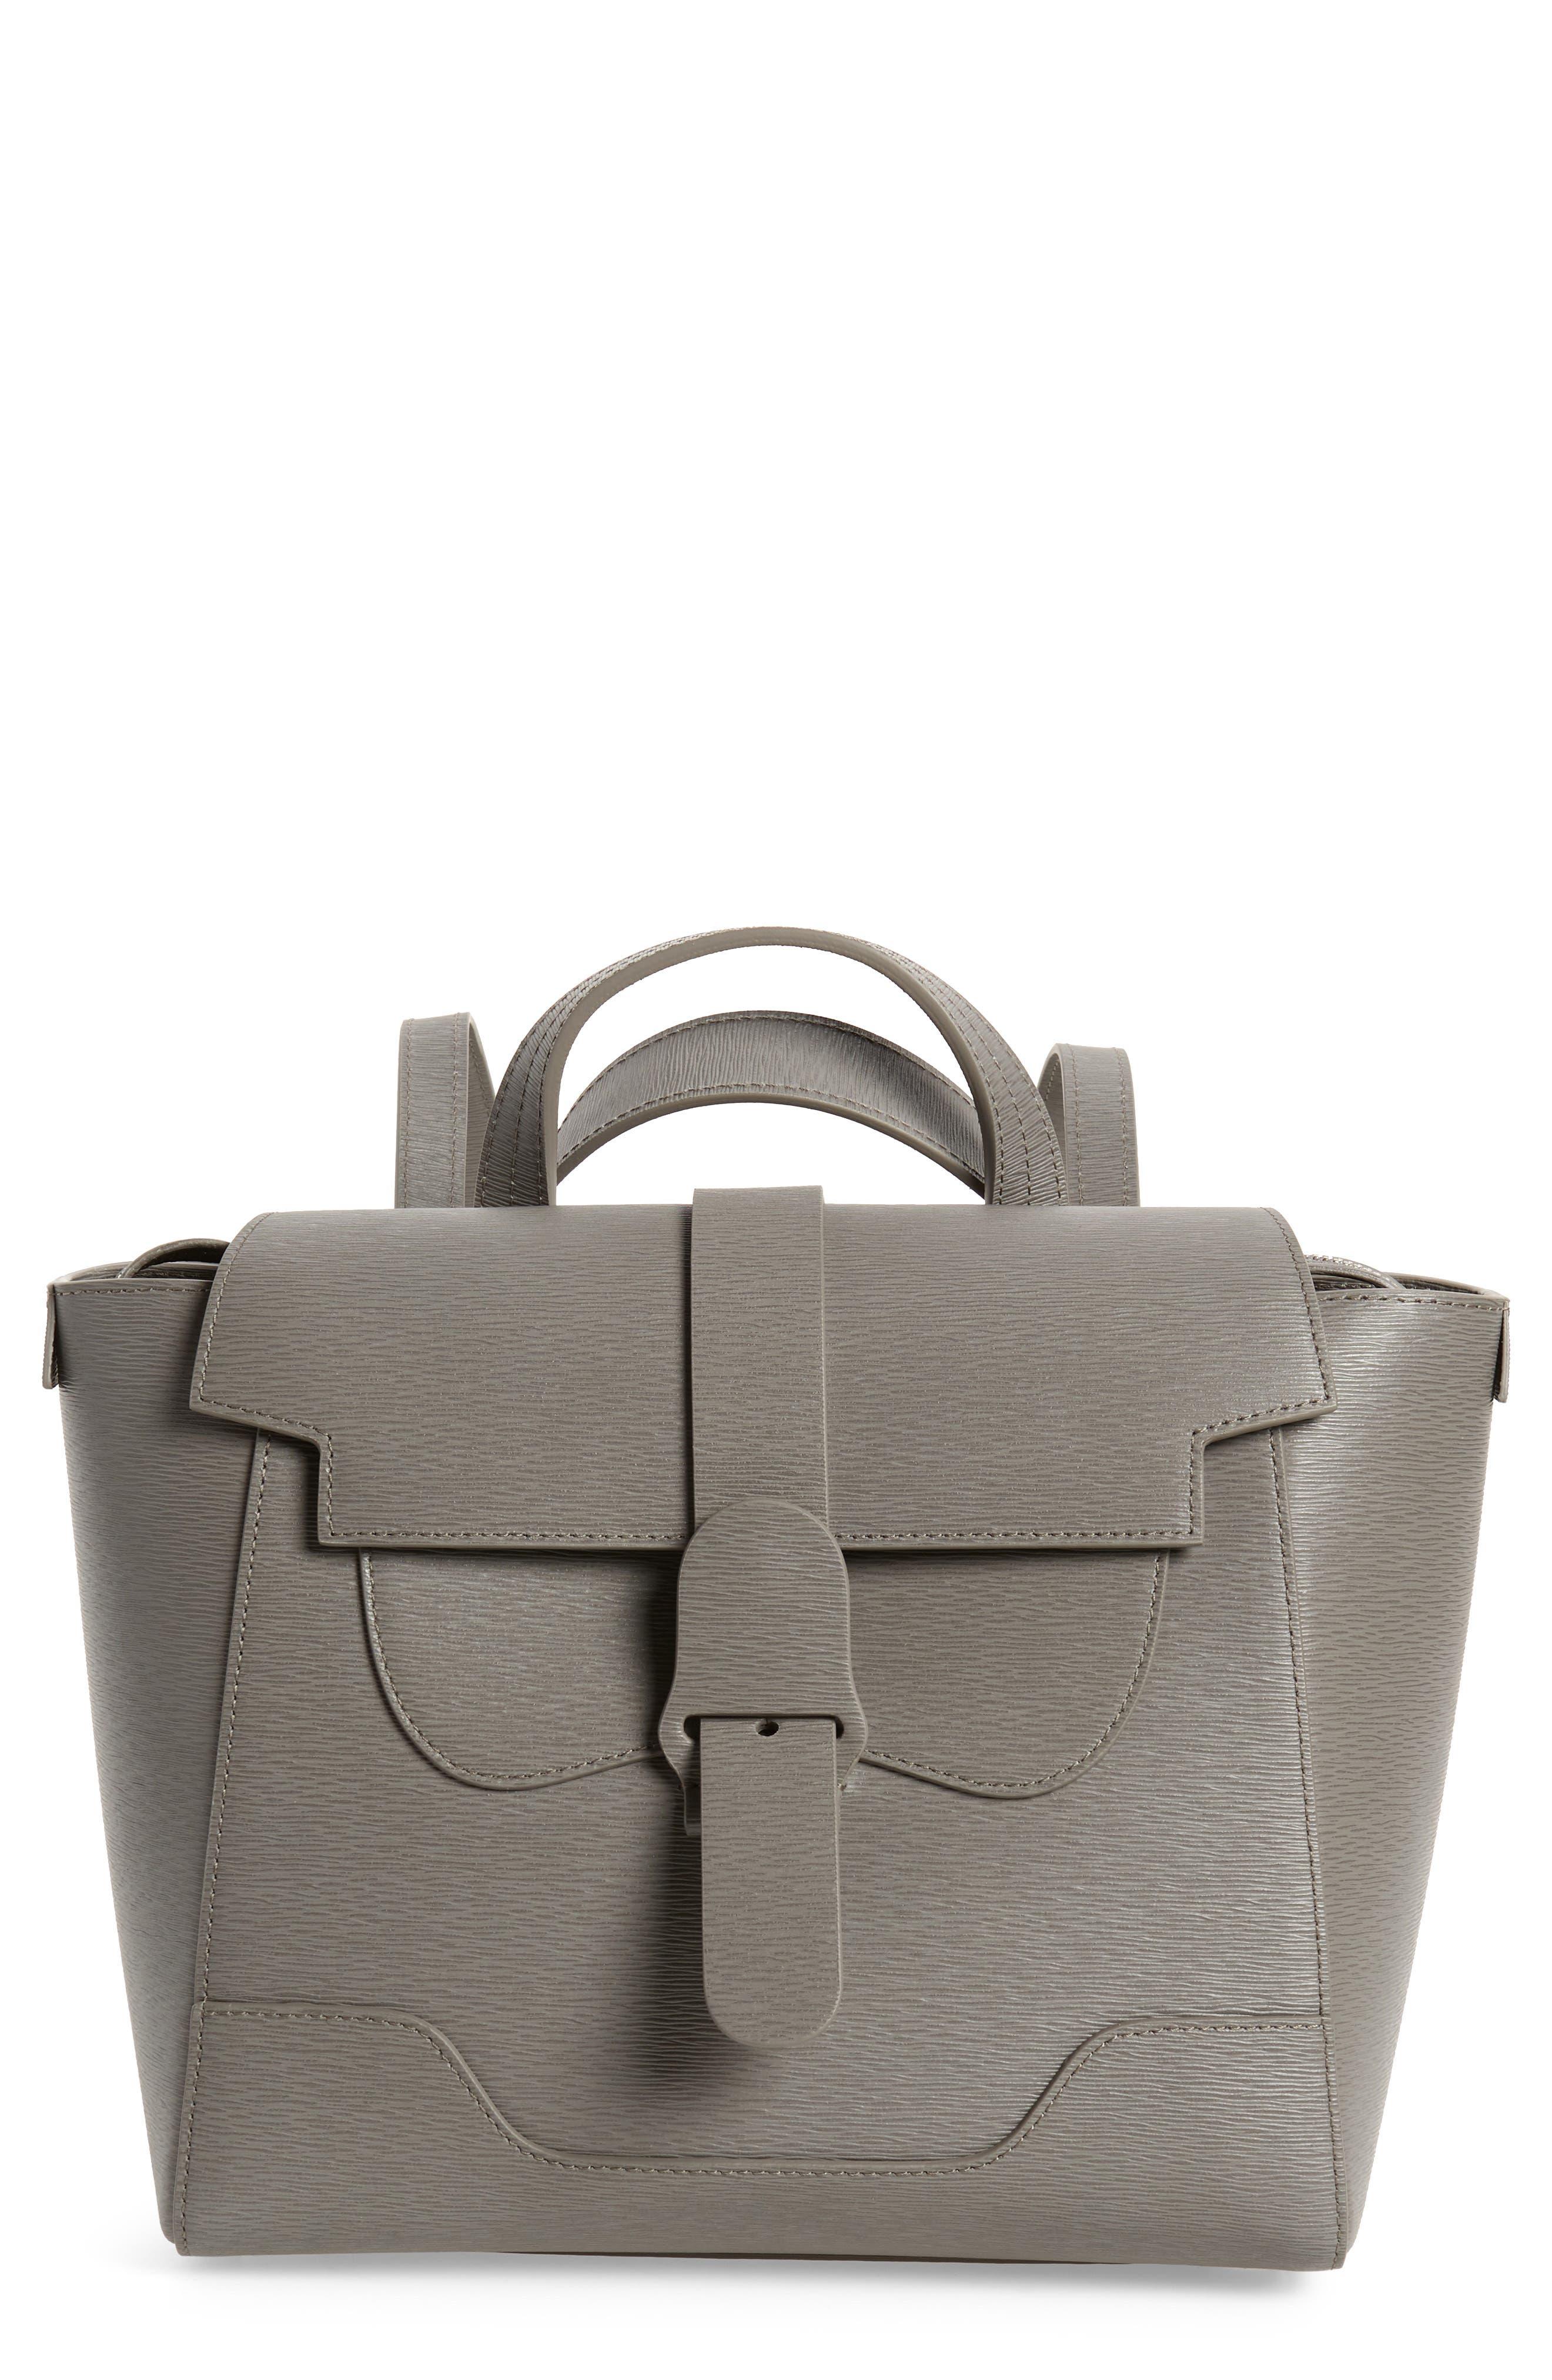 SENREVE Midi Maestra Leather Satchel - Grey in Mimosa Storm